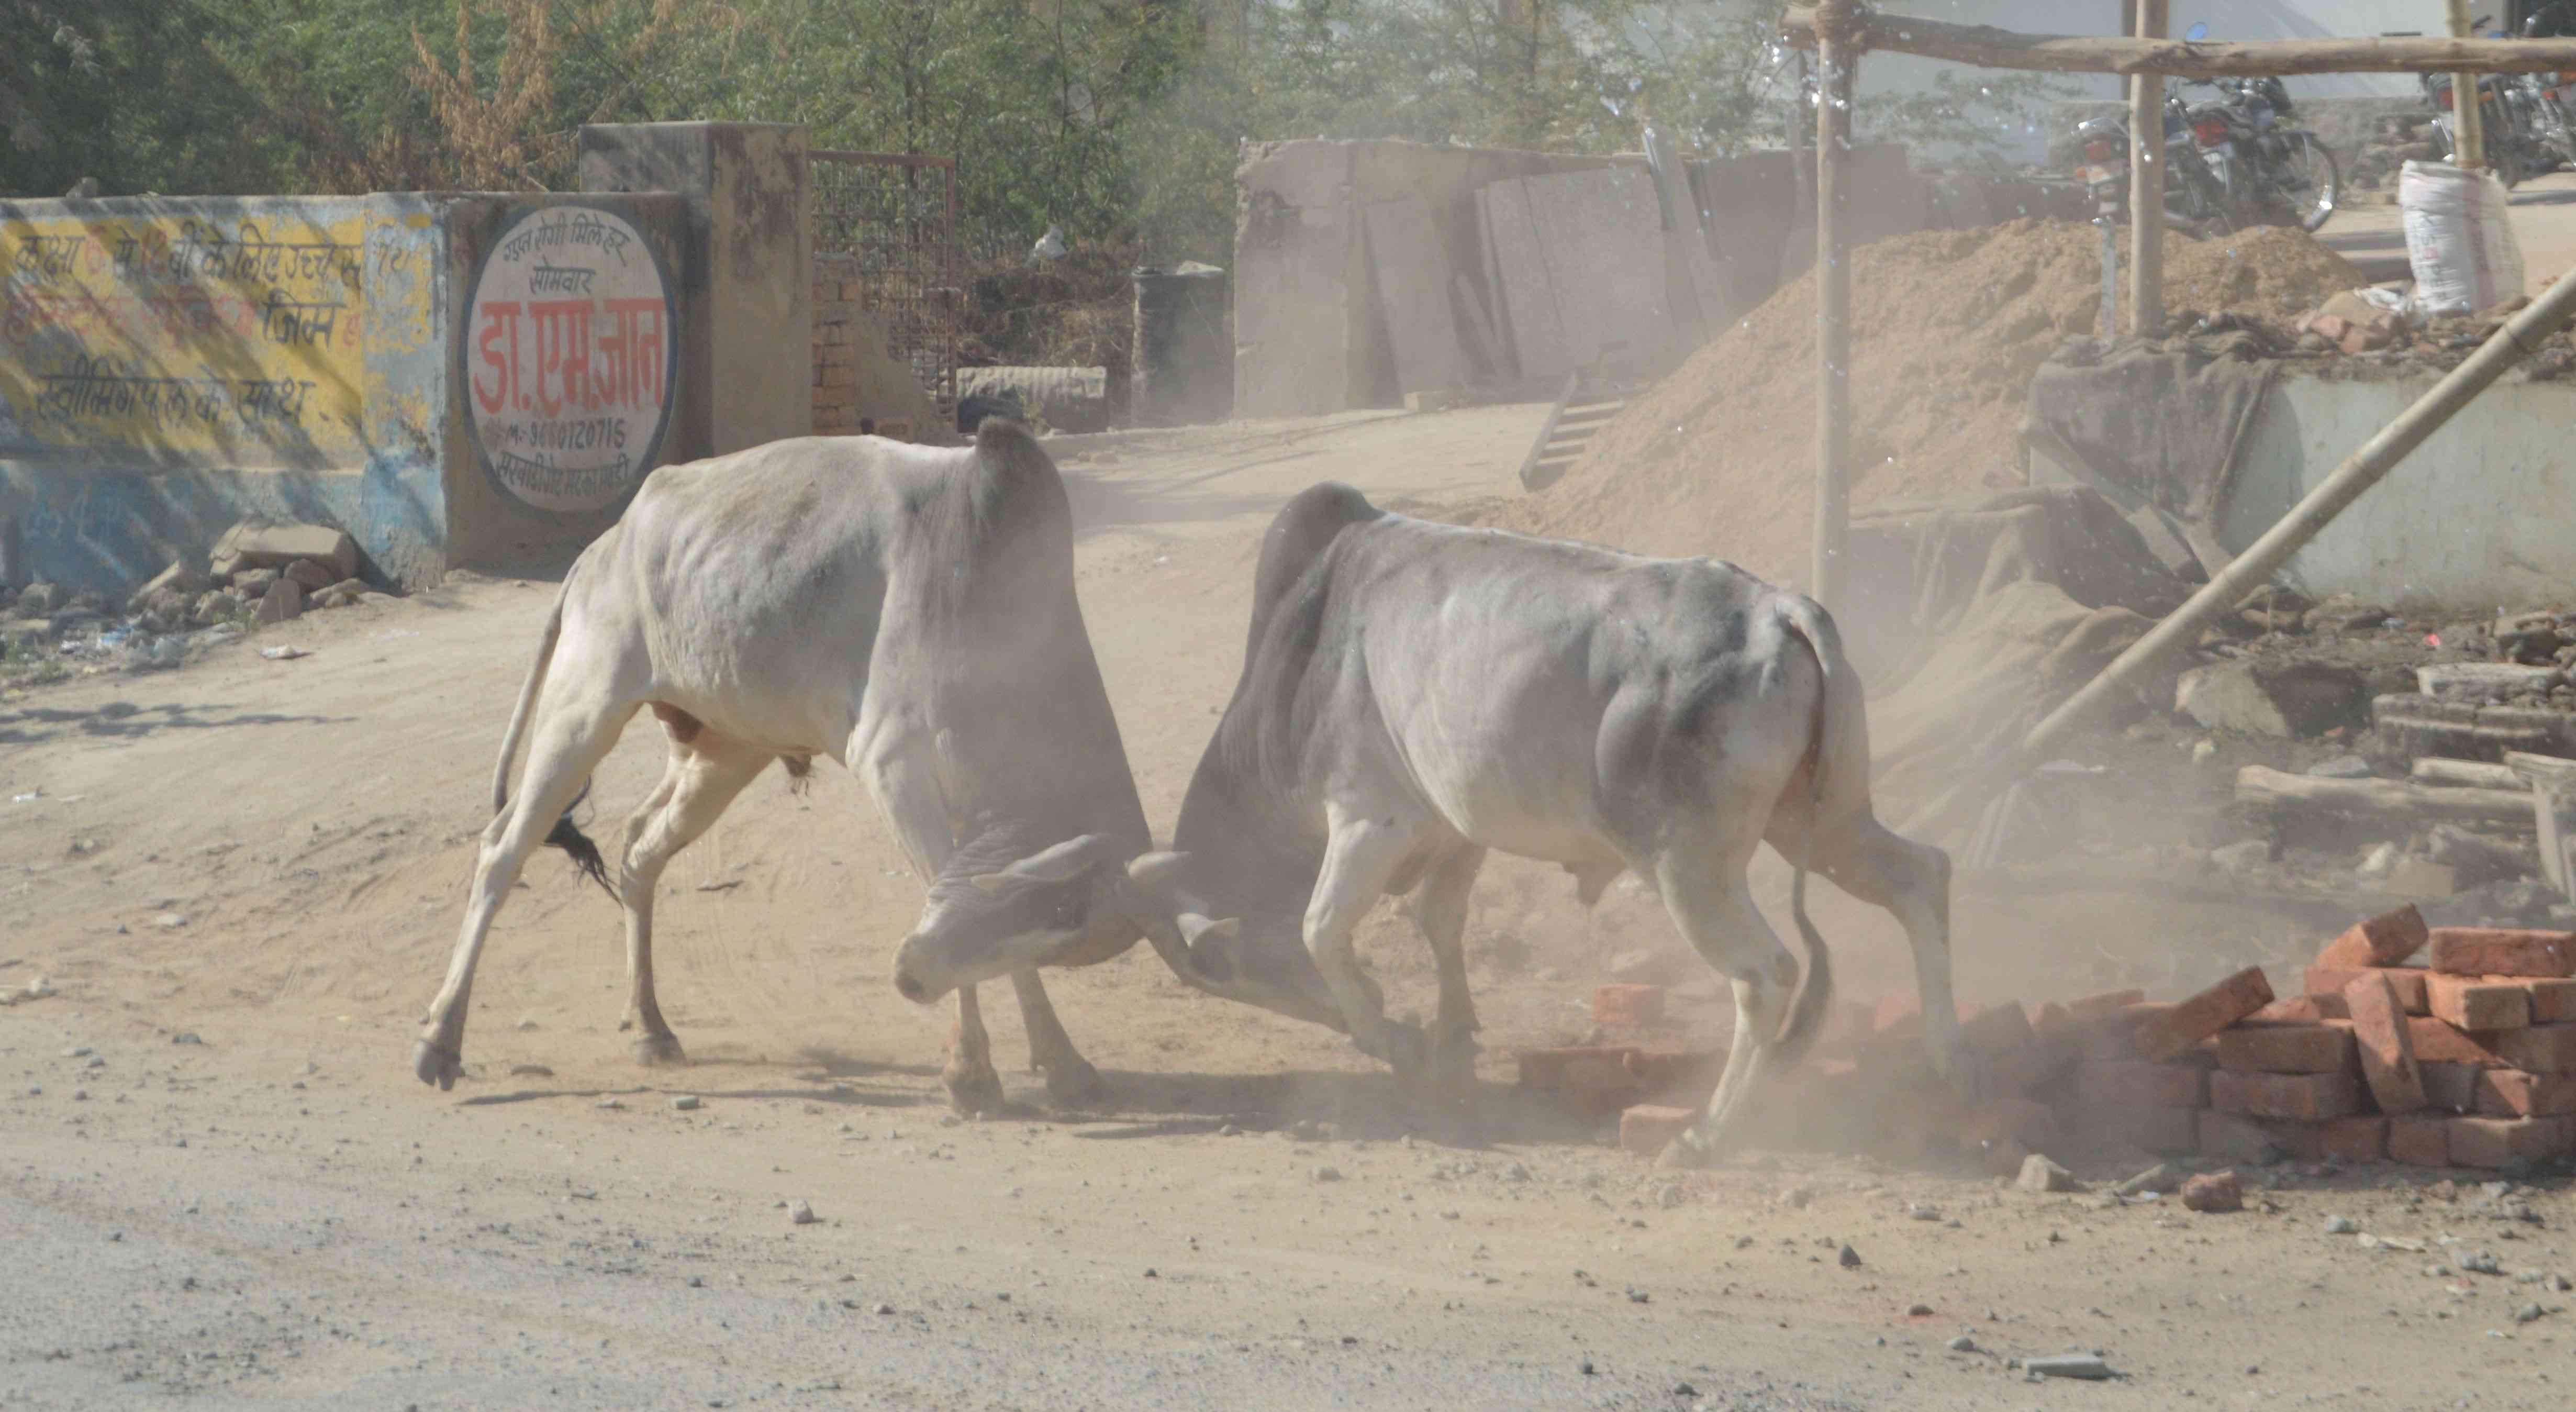 pics of Bull fighting